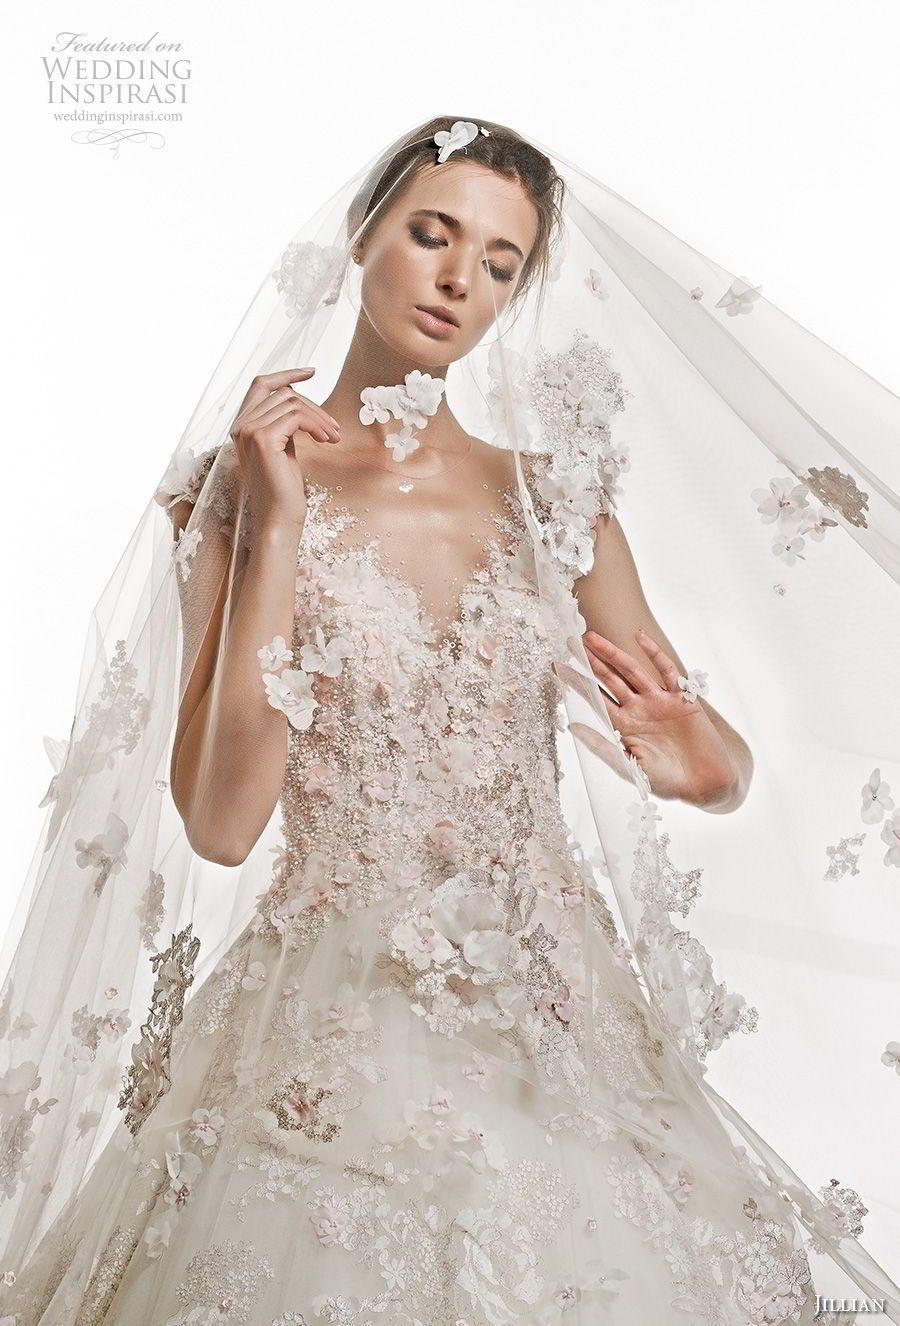 Abiti Da Sposa Jillian.Jillian 2019 Wedding Dresses Abiti Da Sposa Sposa E Moda